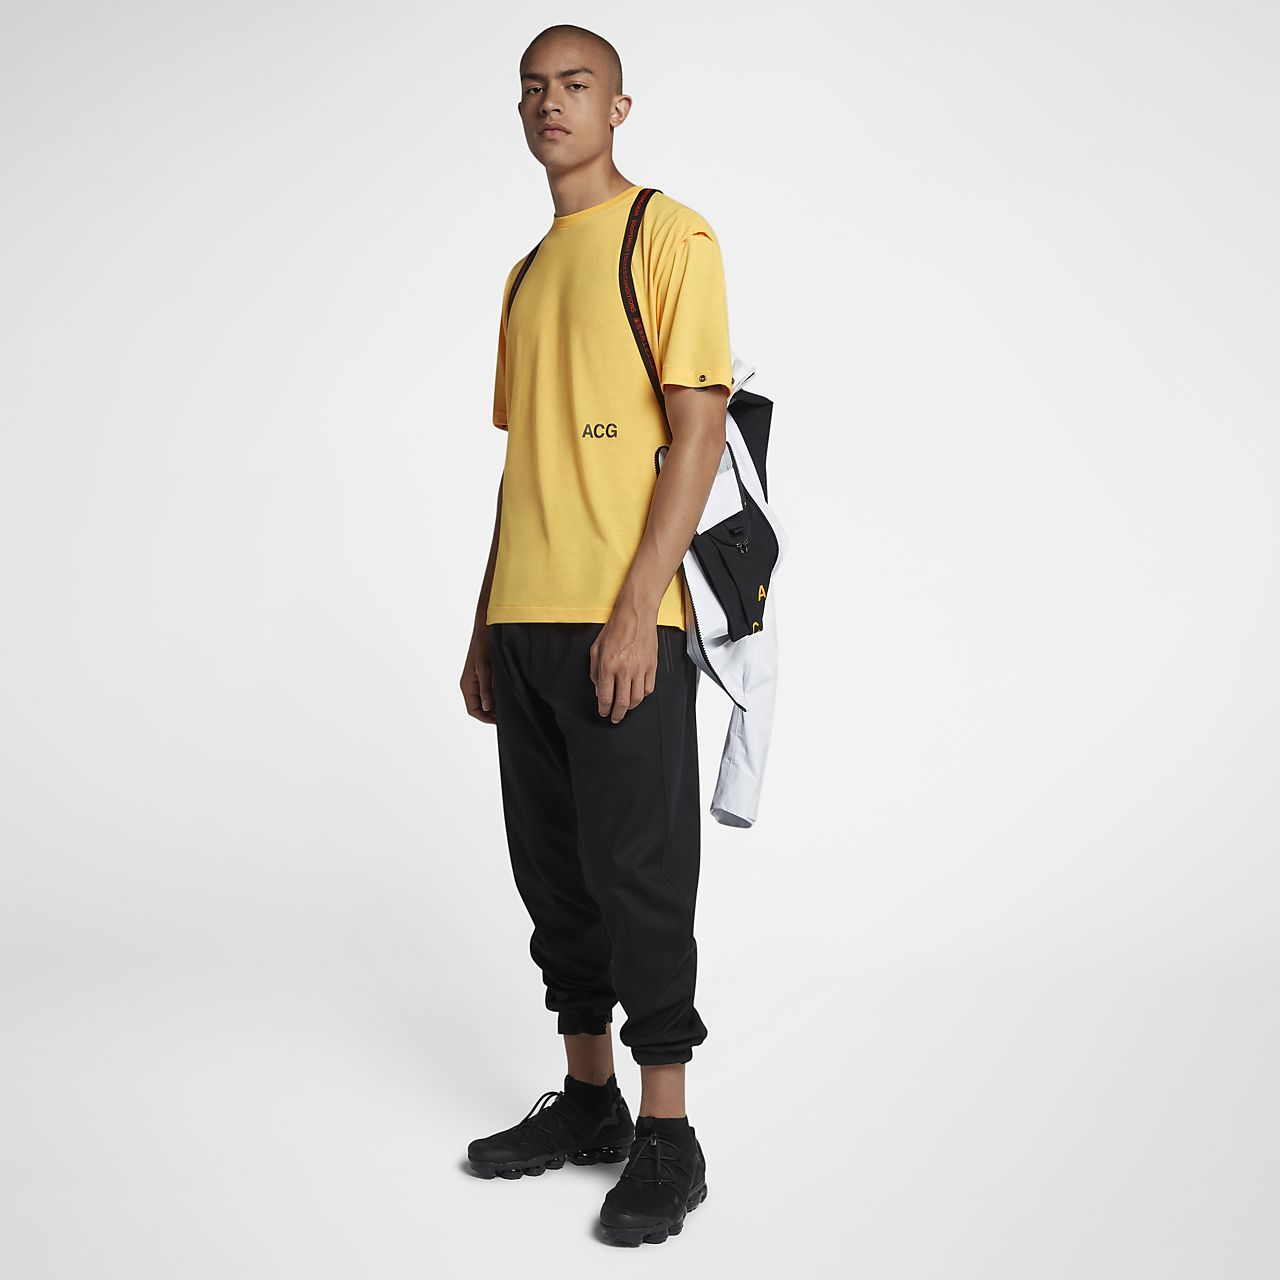 b0ea2f63156d3 NikeLab ACG GORE-TEX® Deploy Men s Jacket